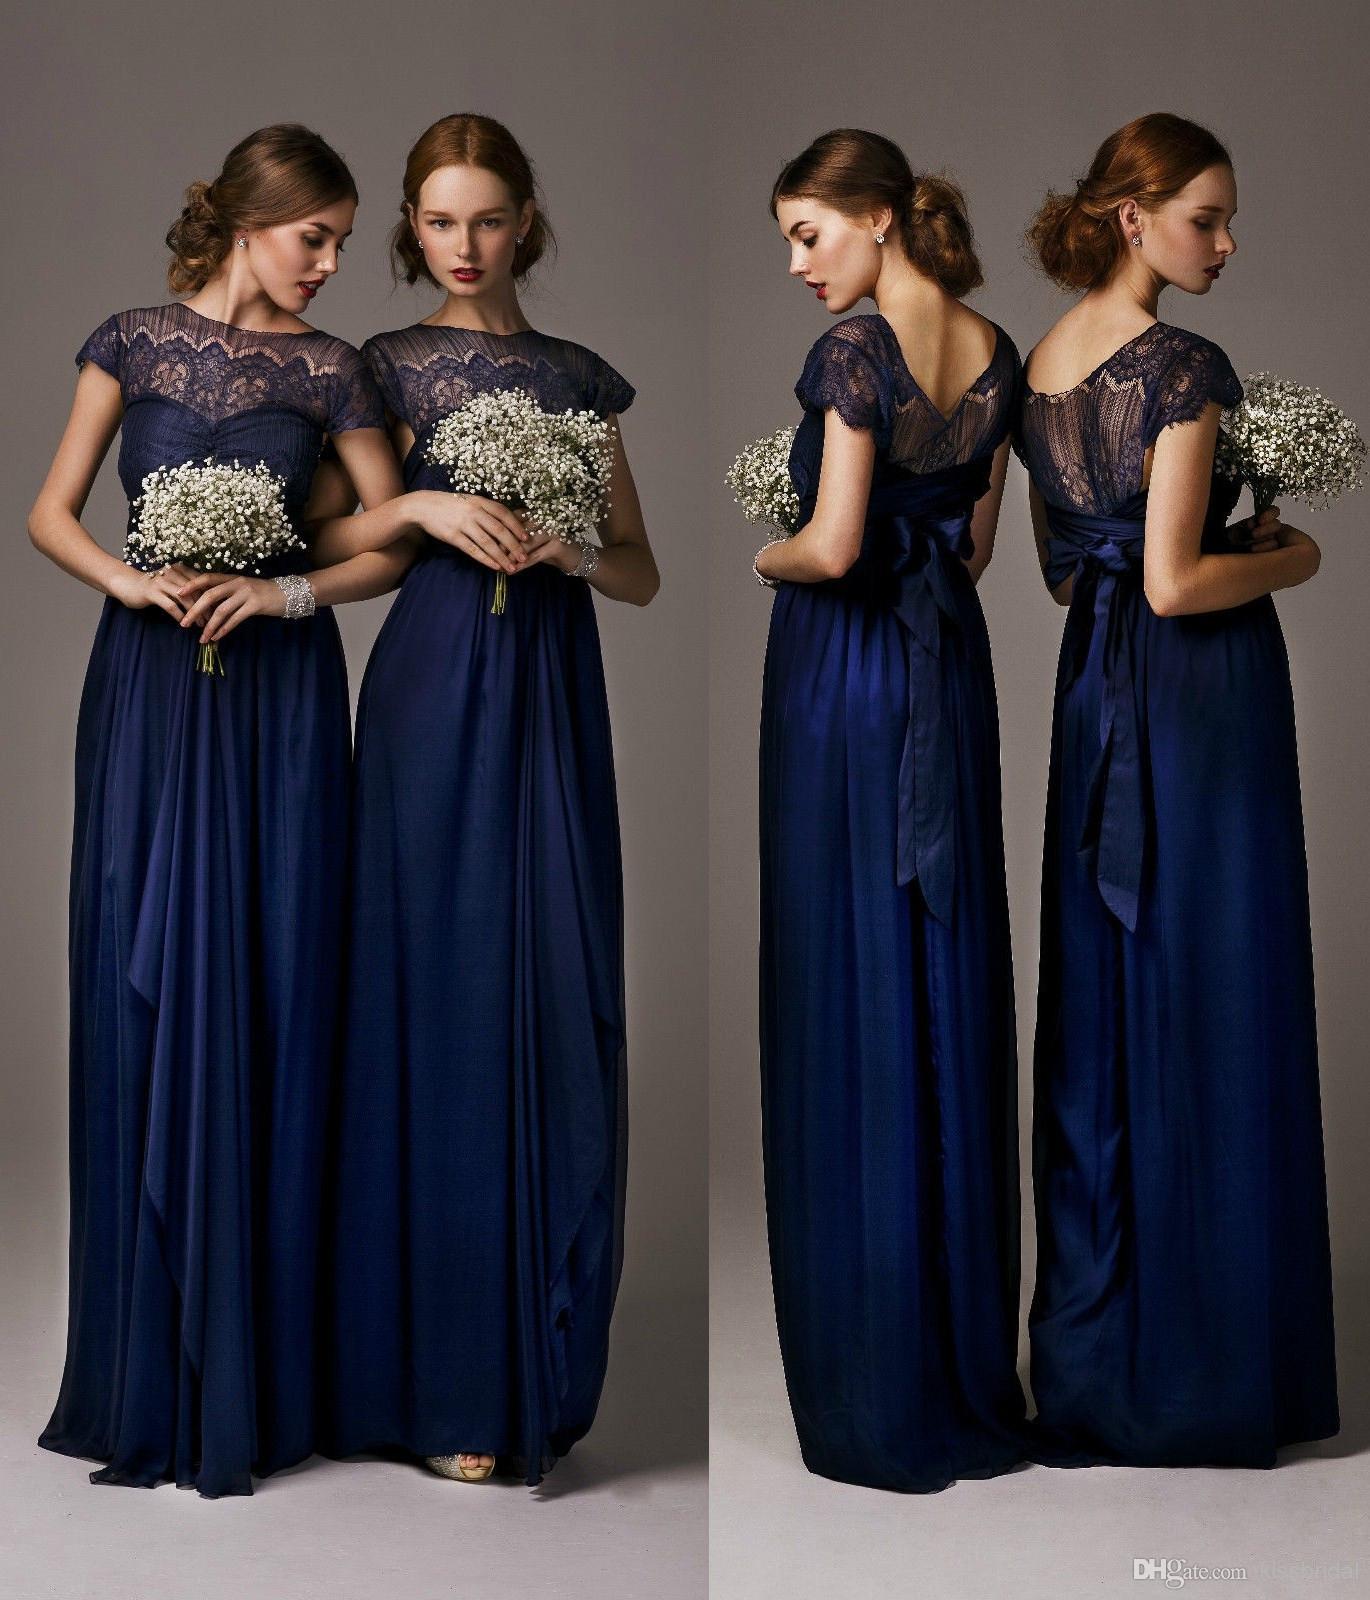 wholesale navy blue bridesmaid dresses